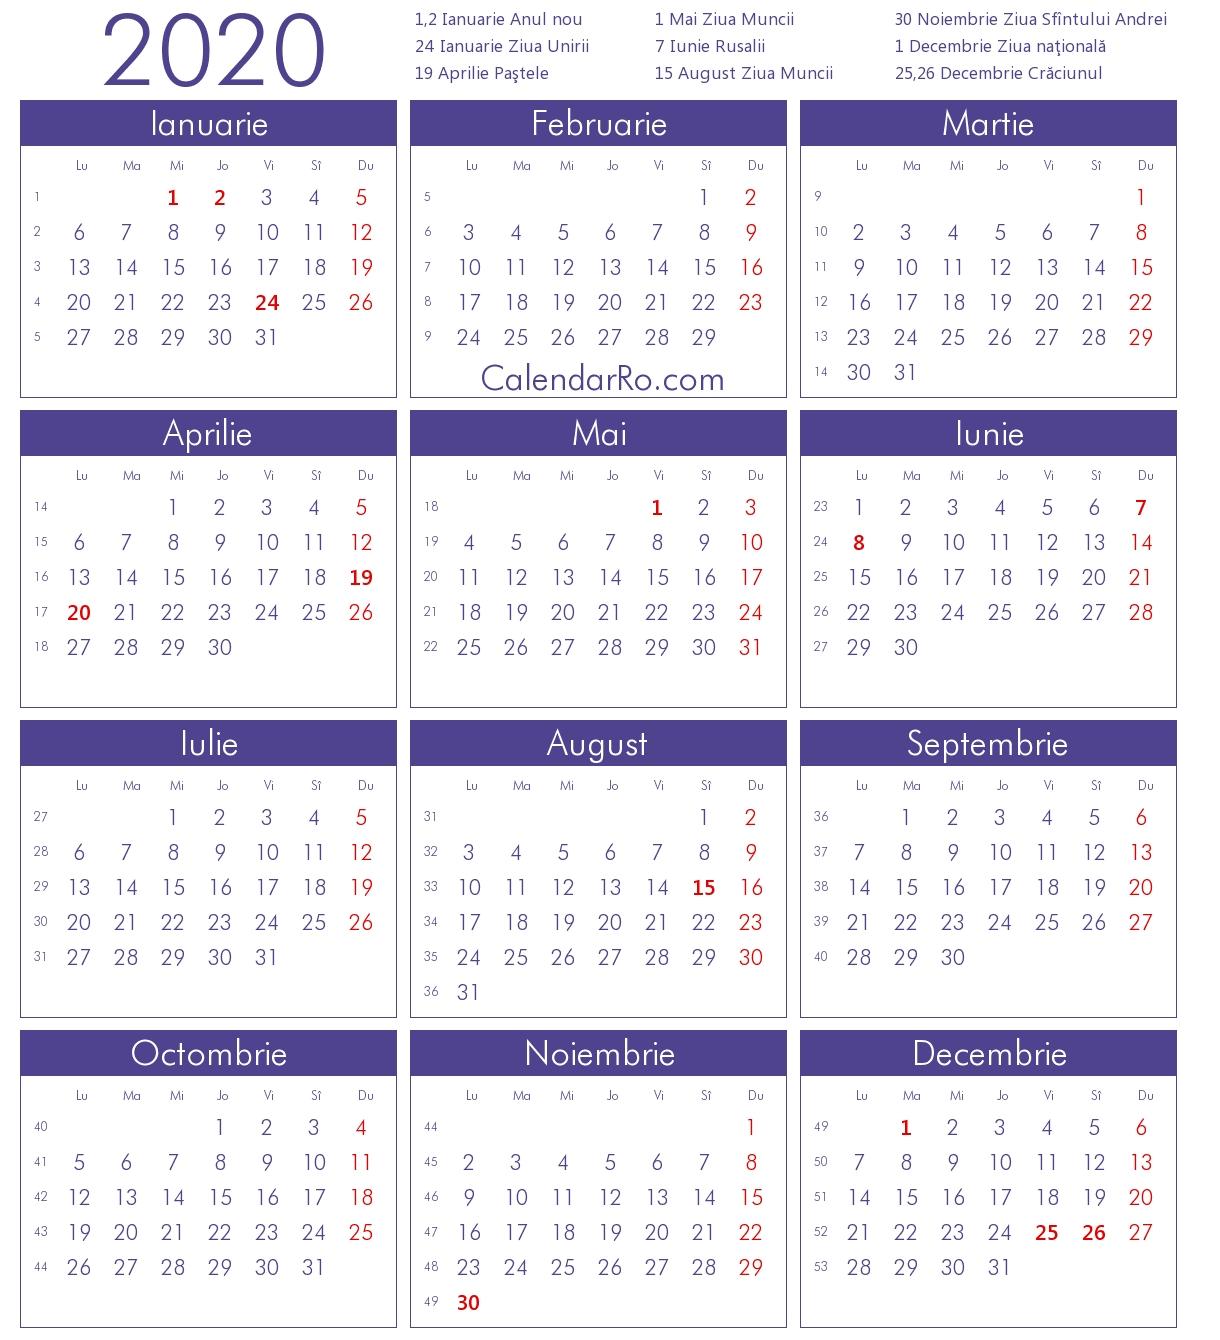 Calendar 2020 Calendar 2020 Romana – Get Your Calendar Printable Calendar 2019 Romana